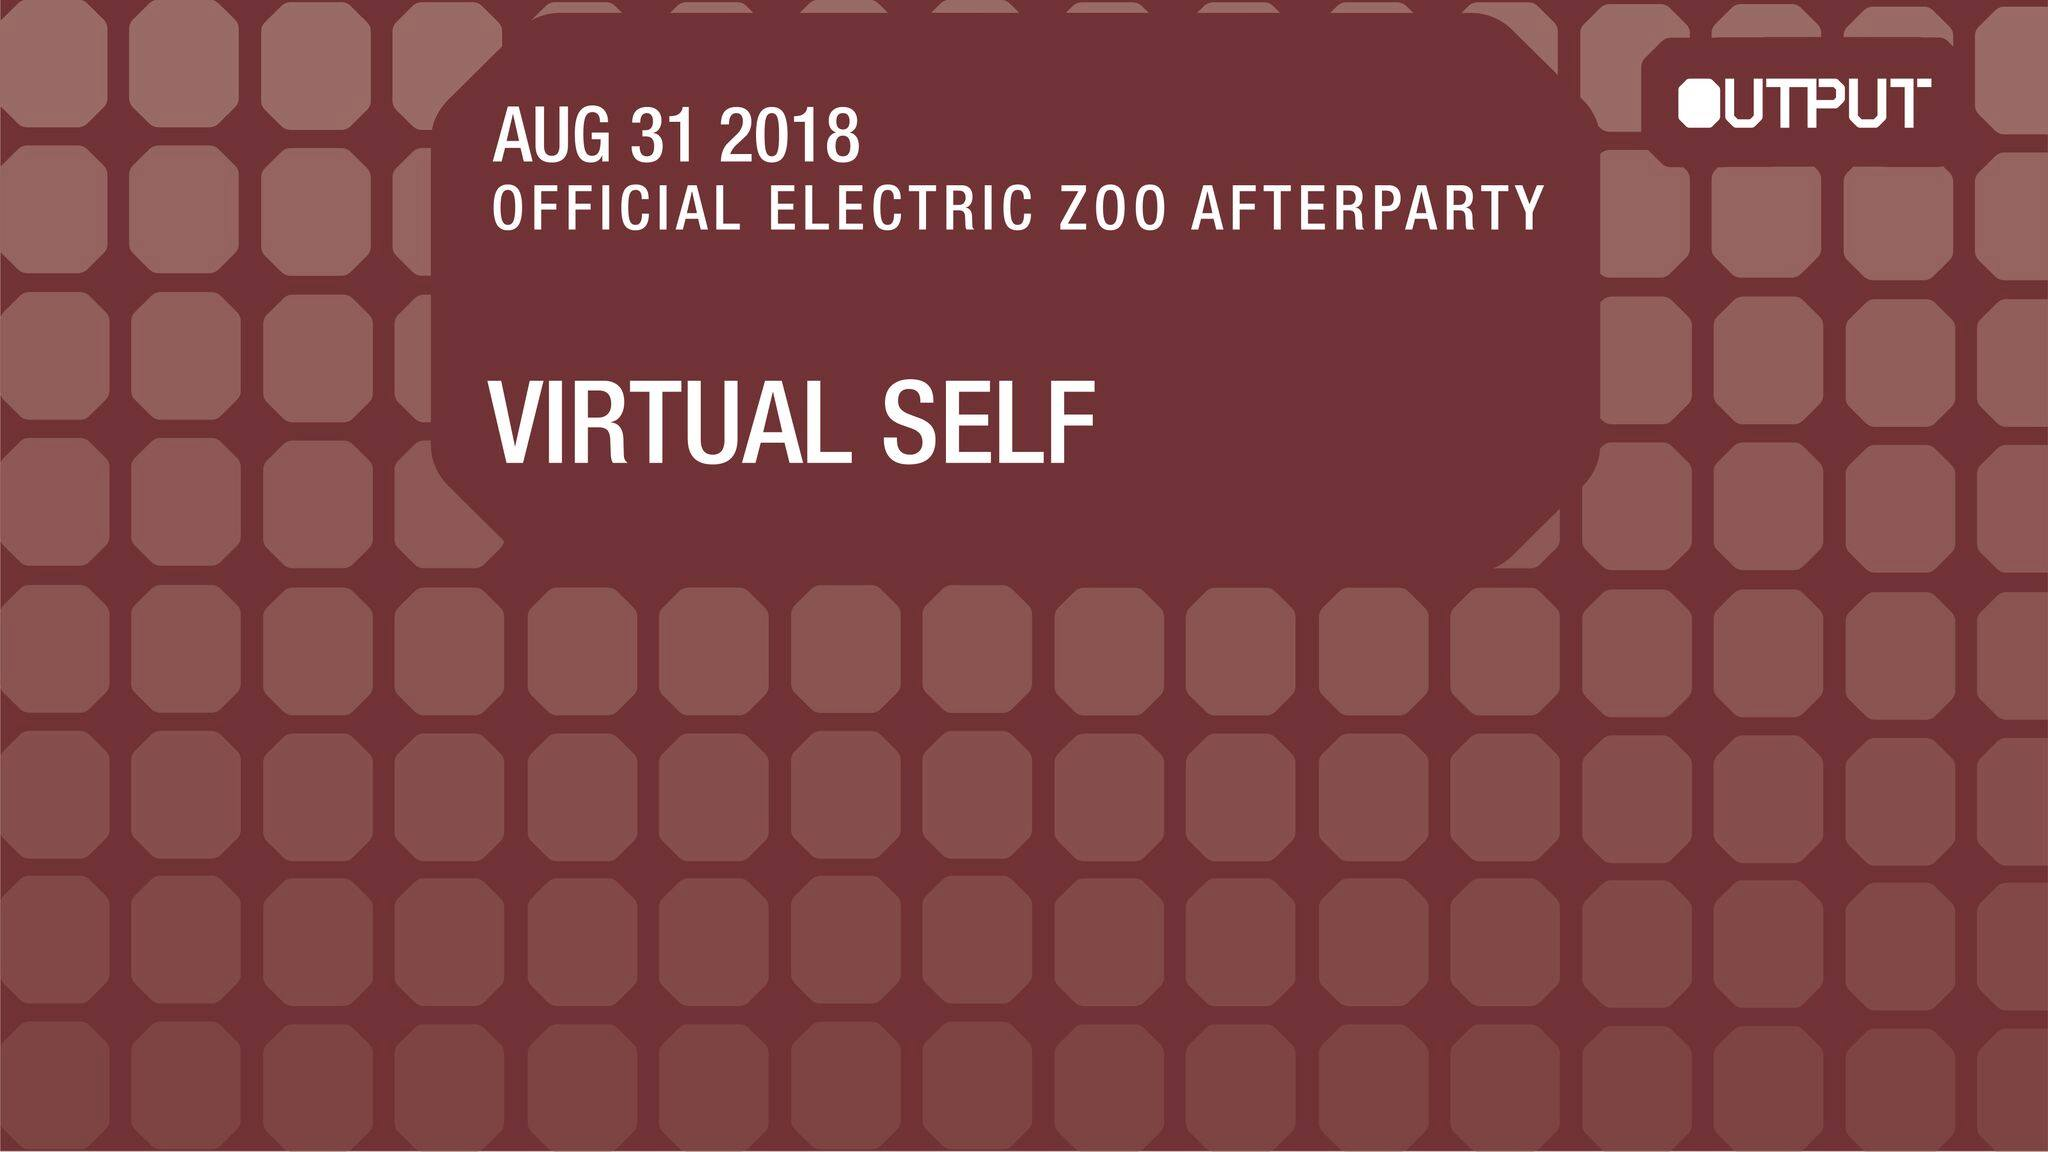 electric zoo 2018 Output Club BK Robbie Lumpkin Promotions